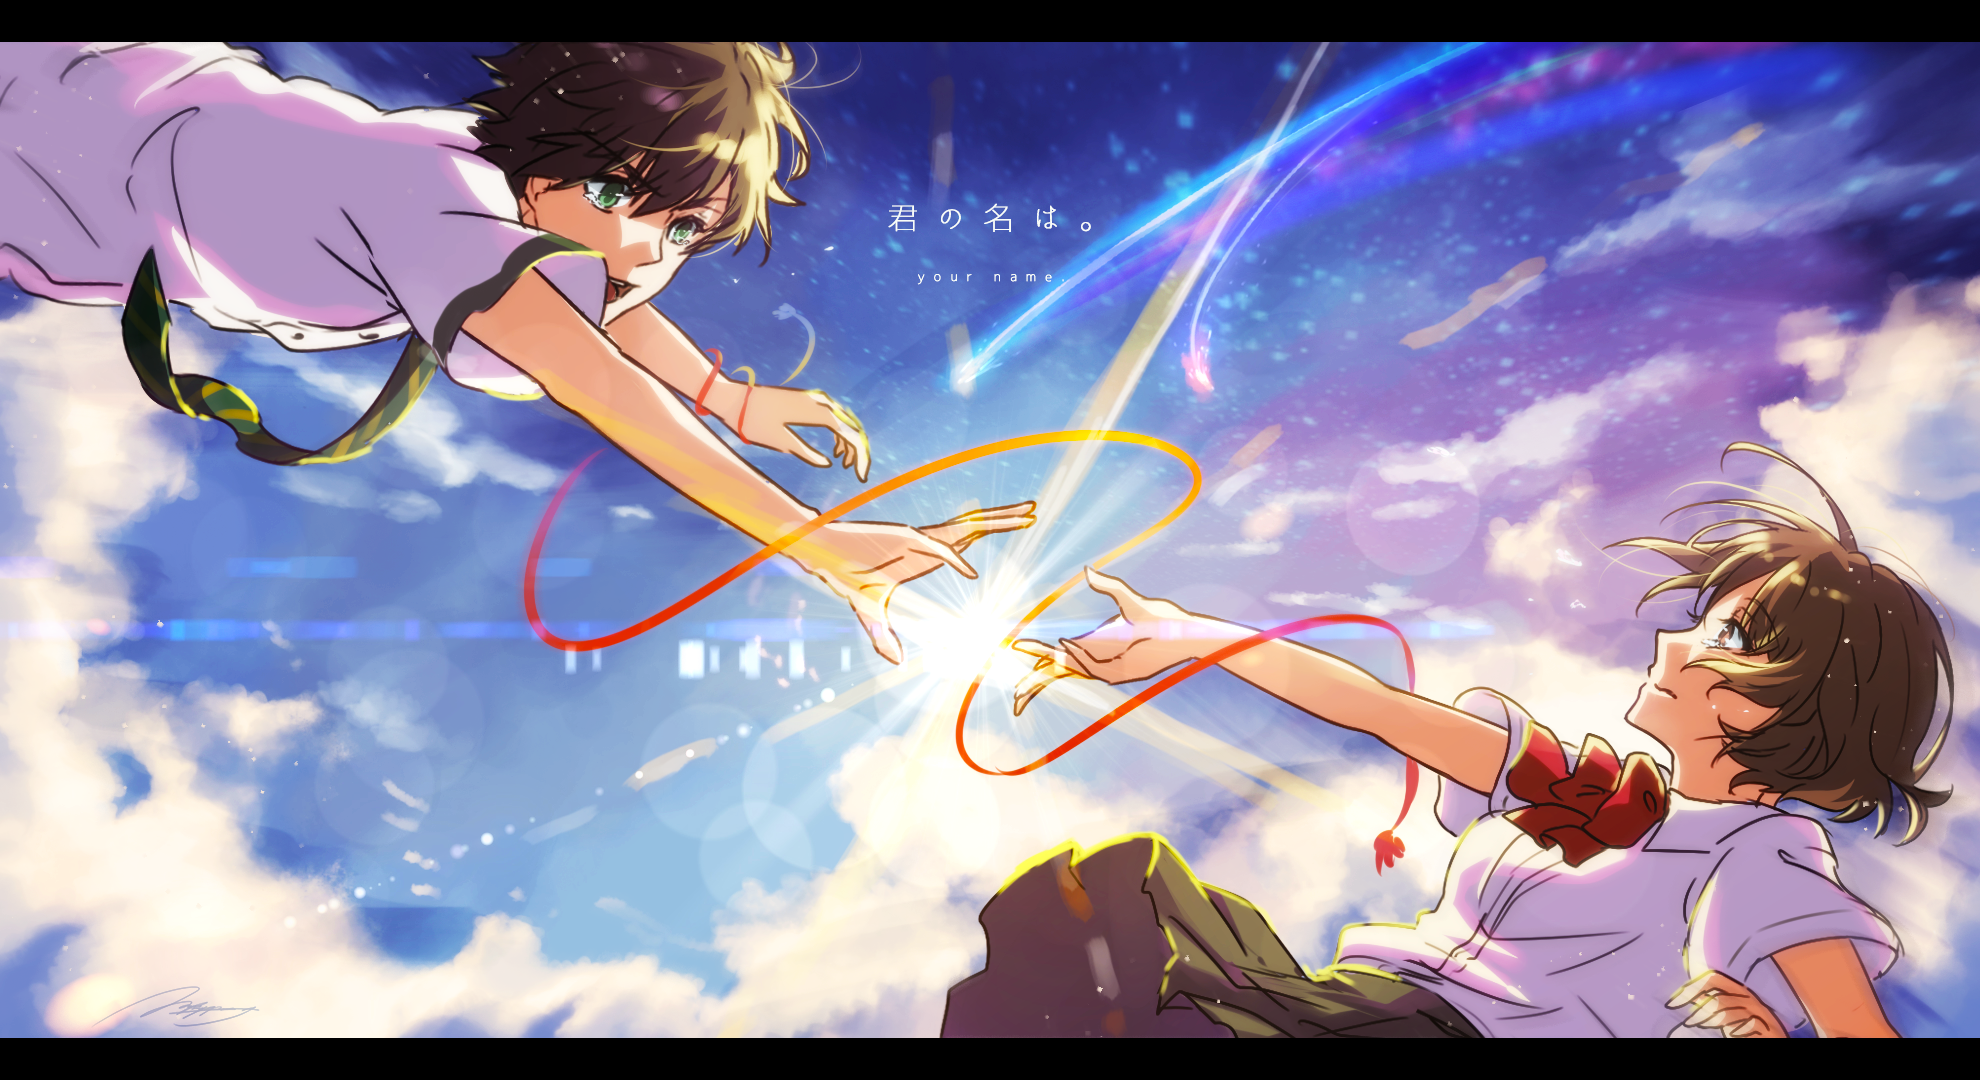 Hd wallpaper kimi no na wa - Kimi No Na Wa Mitsuha Miyamizu Your Name Hd Wallpaper Background Id 732084